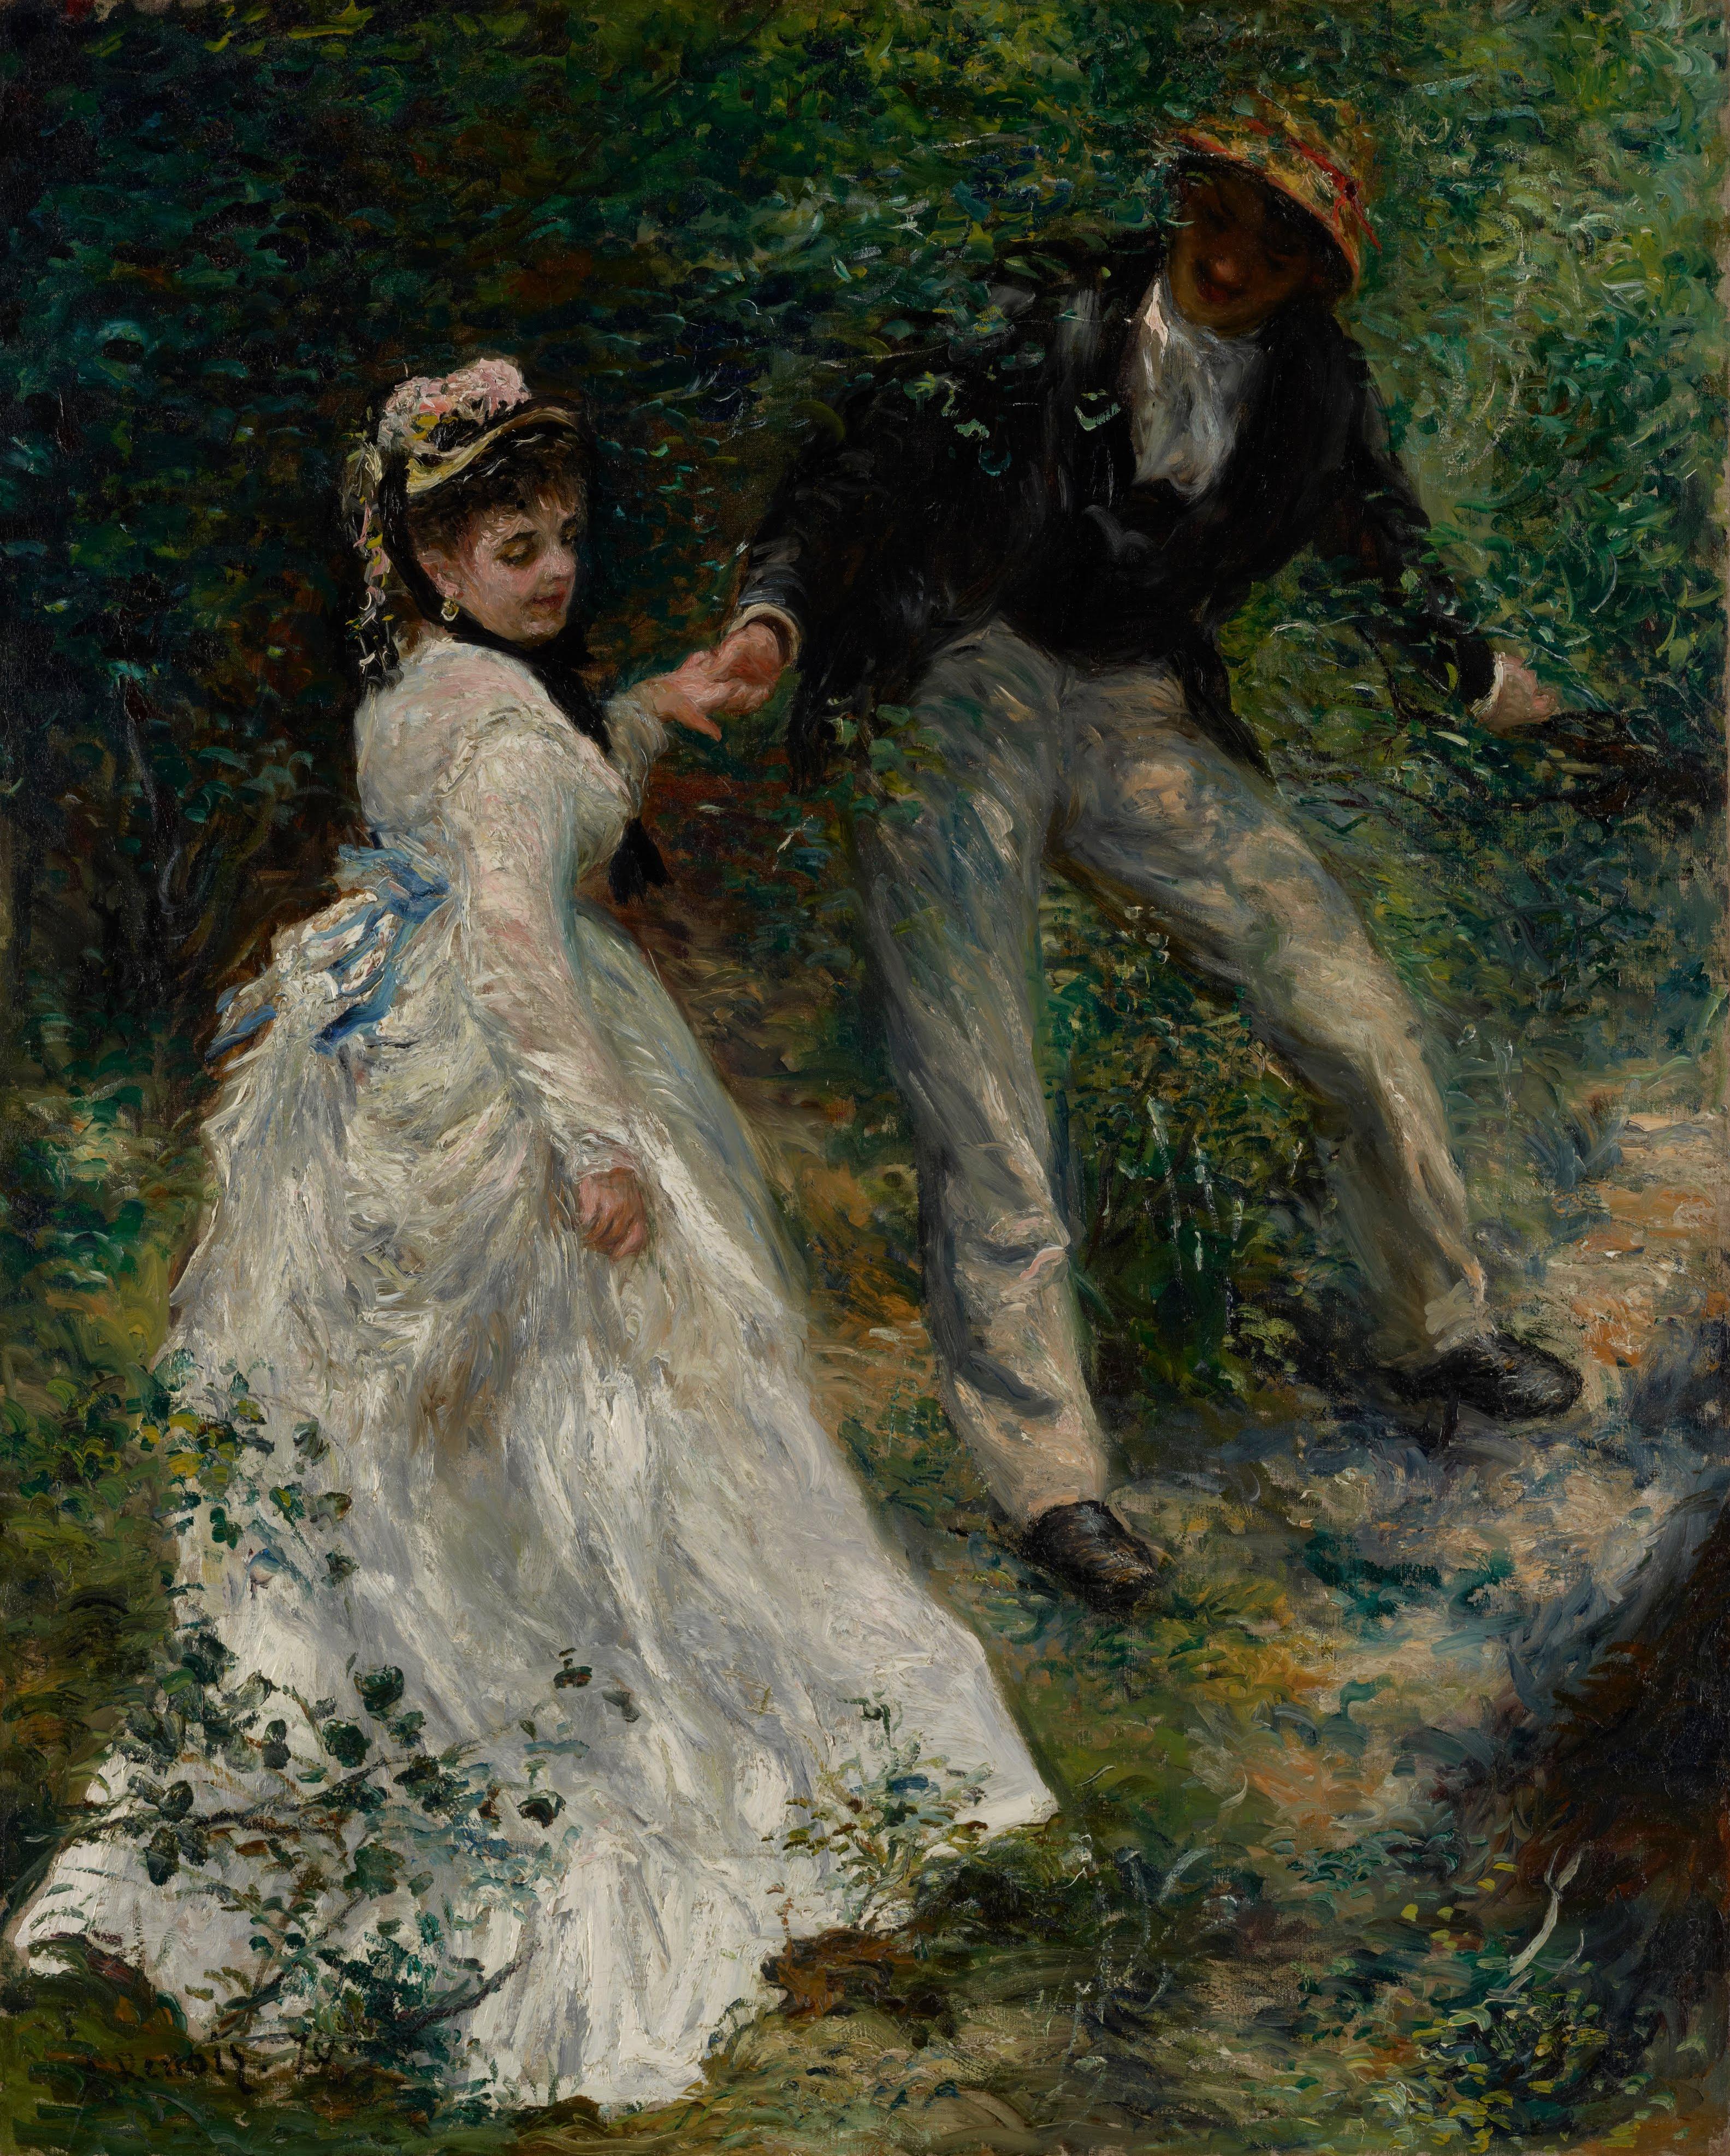 Пьер Огюст Ренуар. Прогулка (La Promenade), 1870